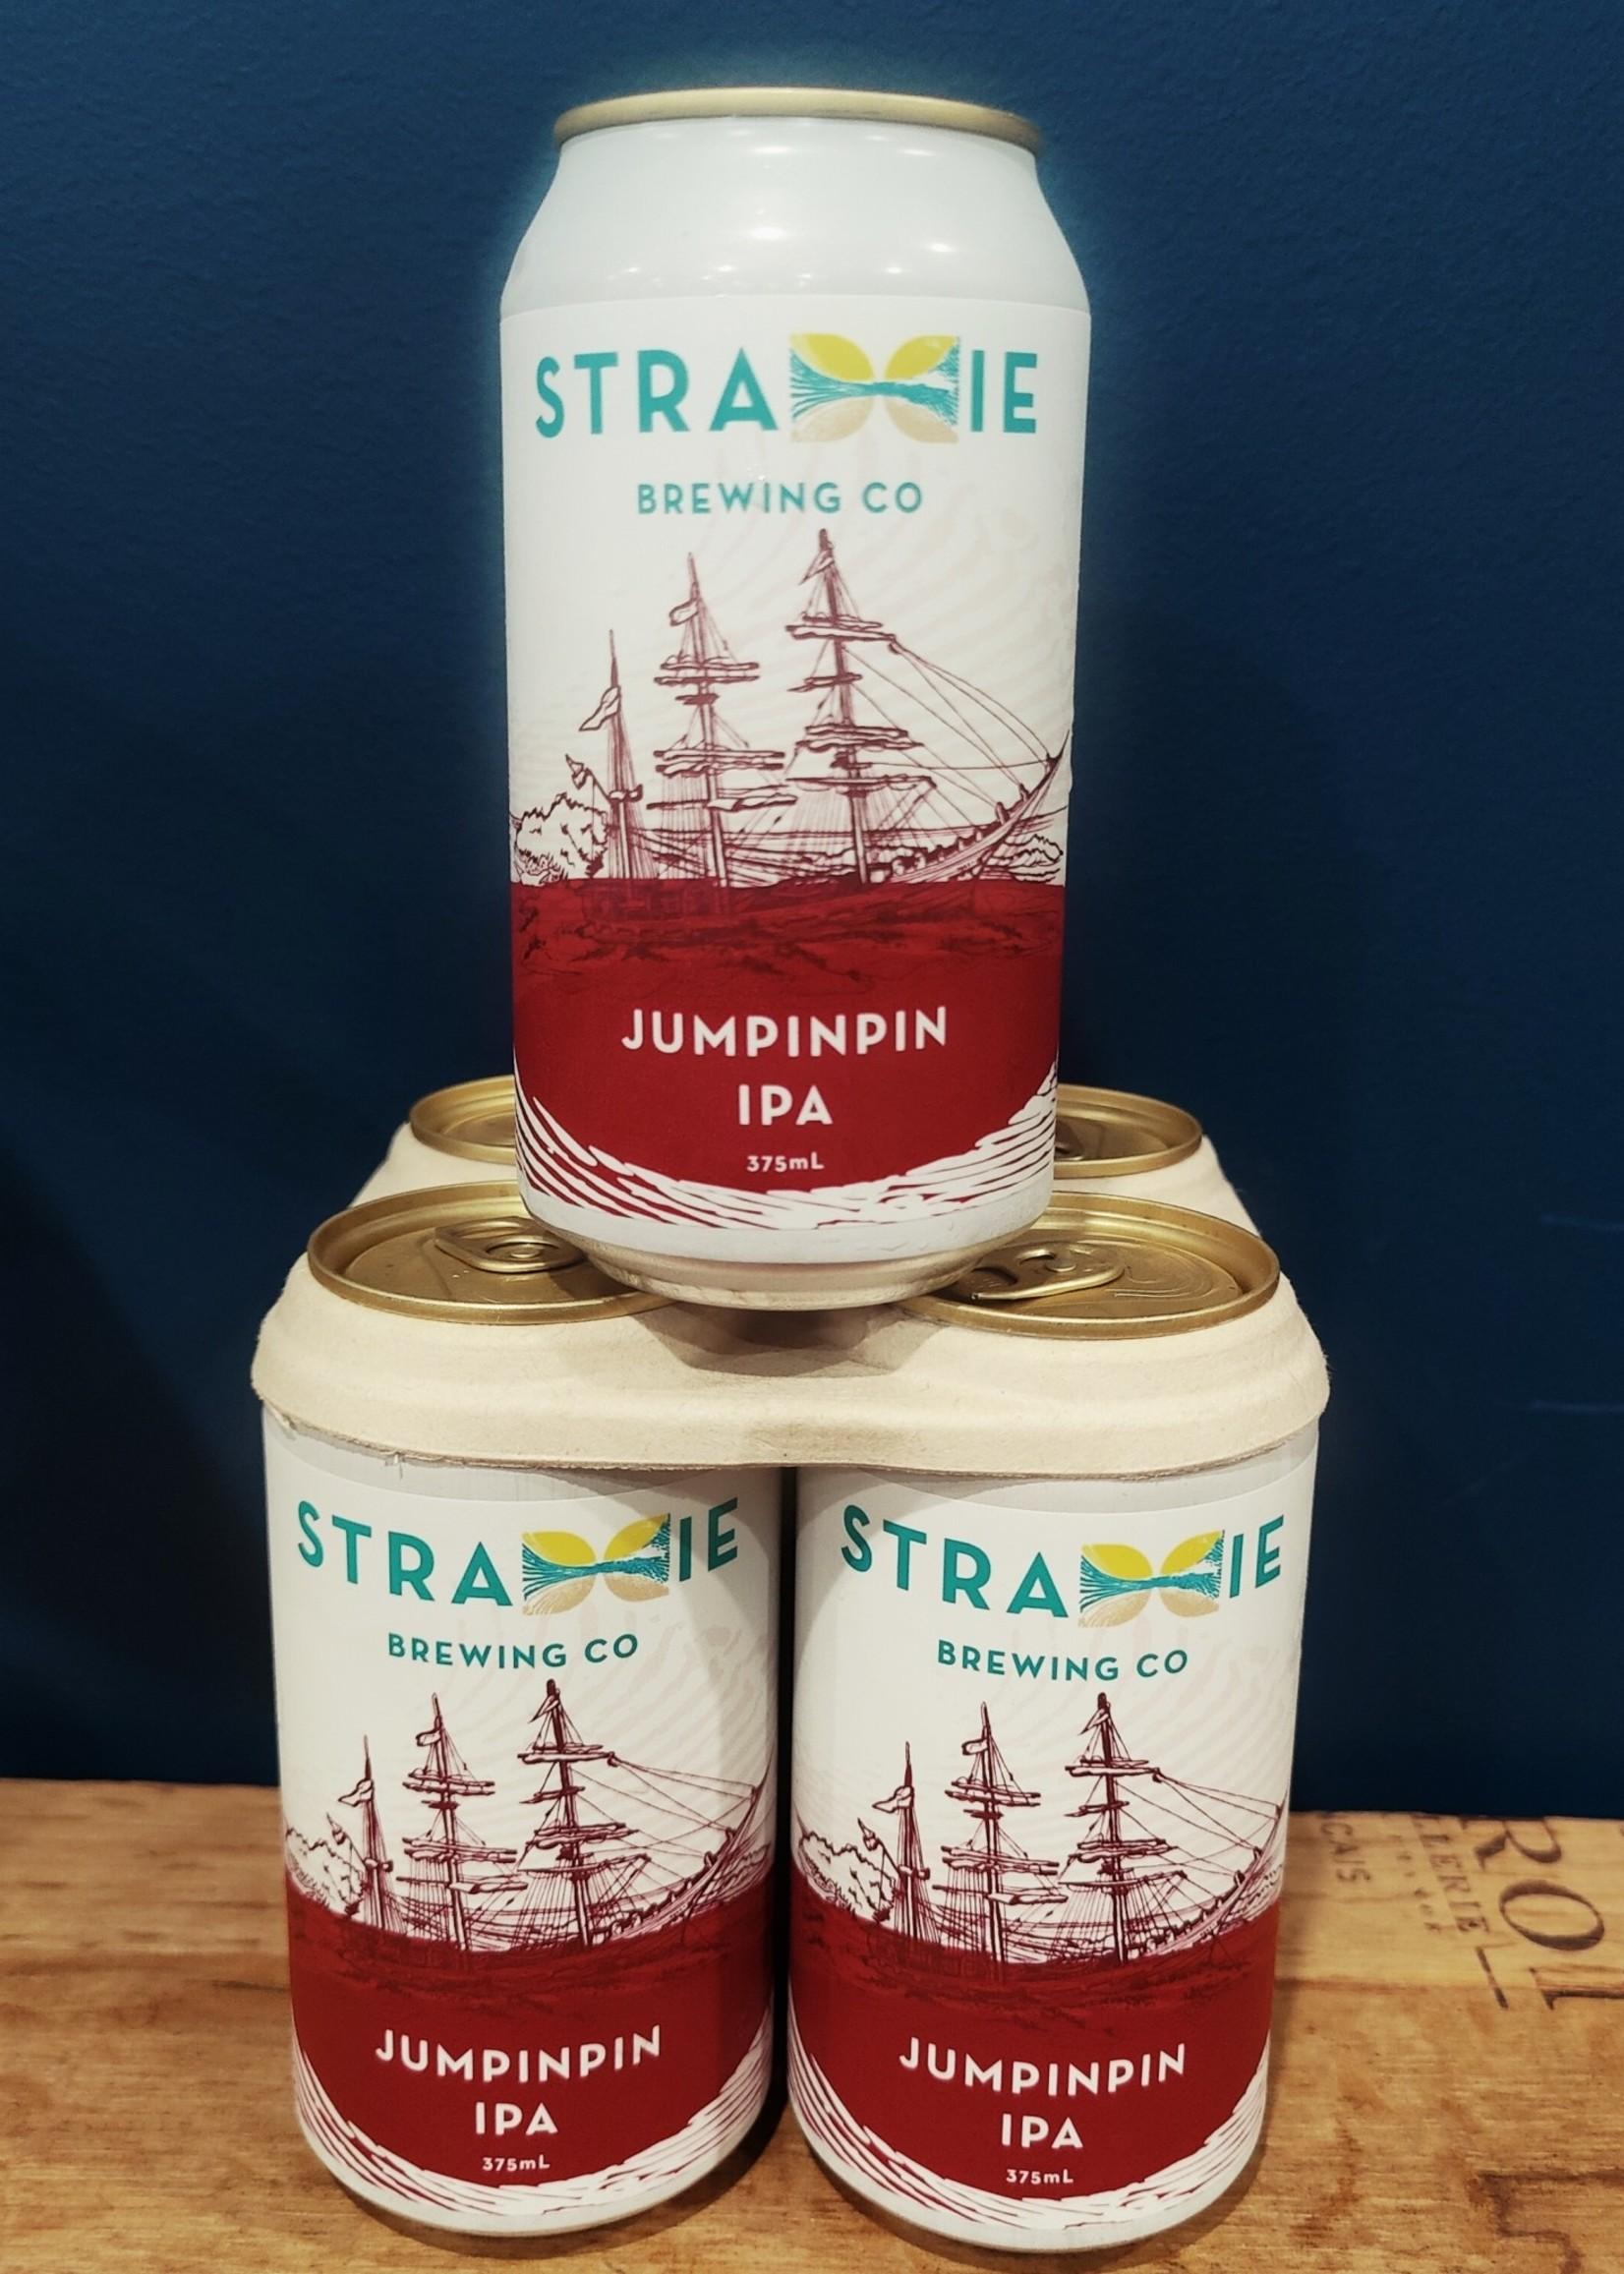 Stradbroke Brewing Co. Jumpinpin IPA